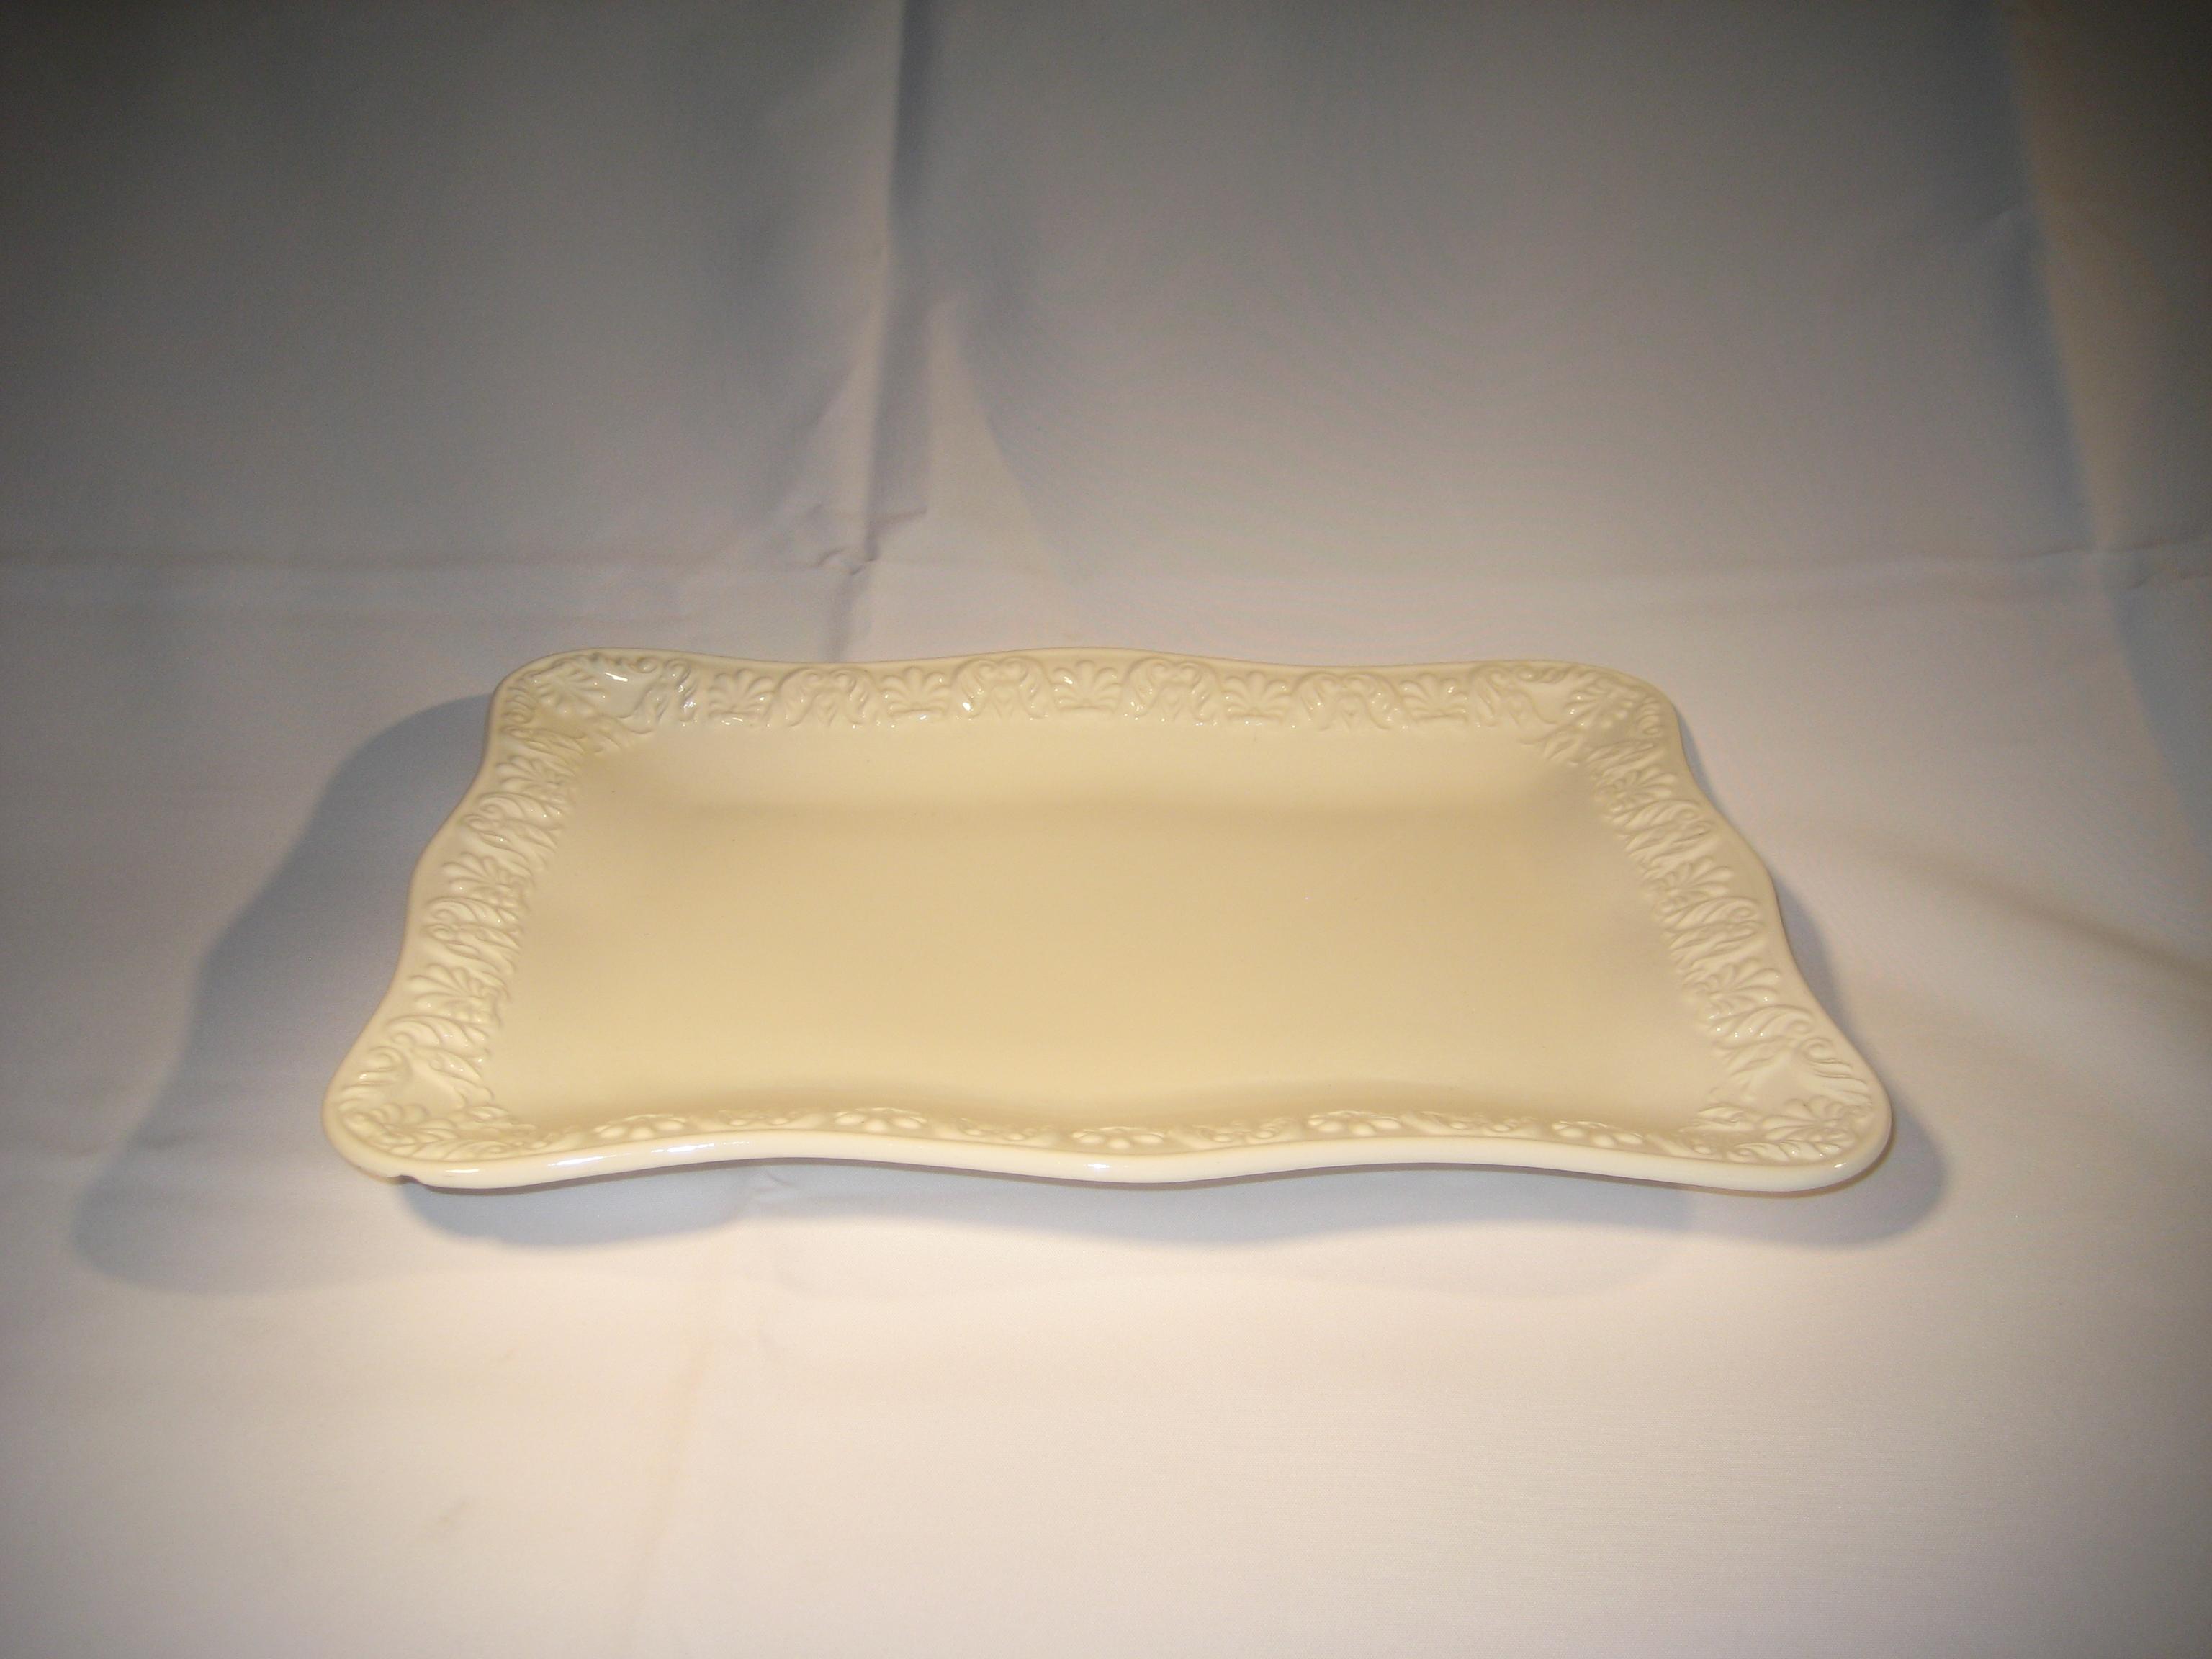 White Bizzirri Tray 16×12 or 22×17 & White Bizzirri Tray 16x12 or 22x17   A Grand Event